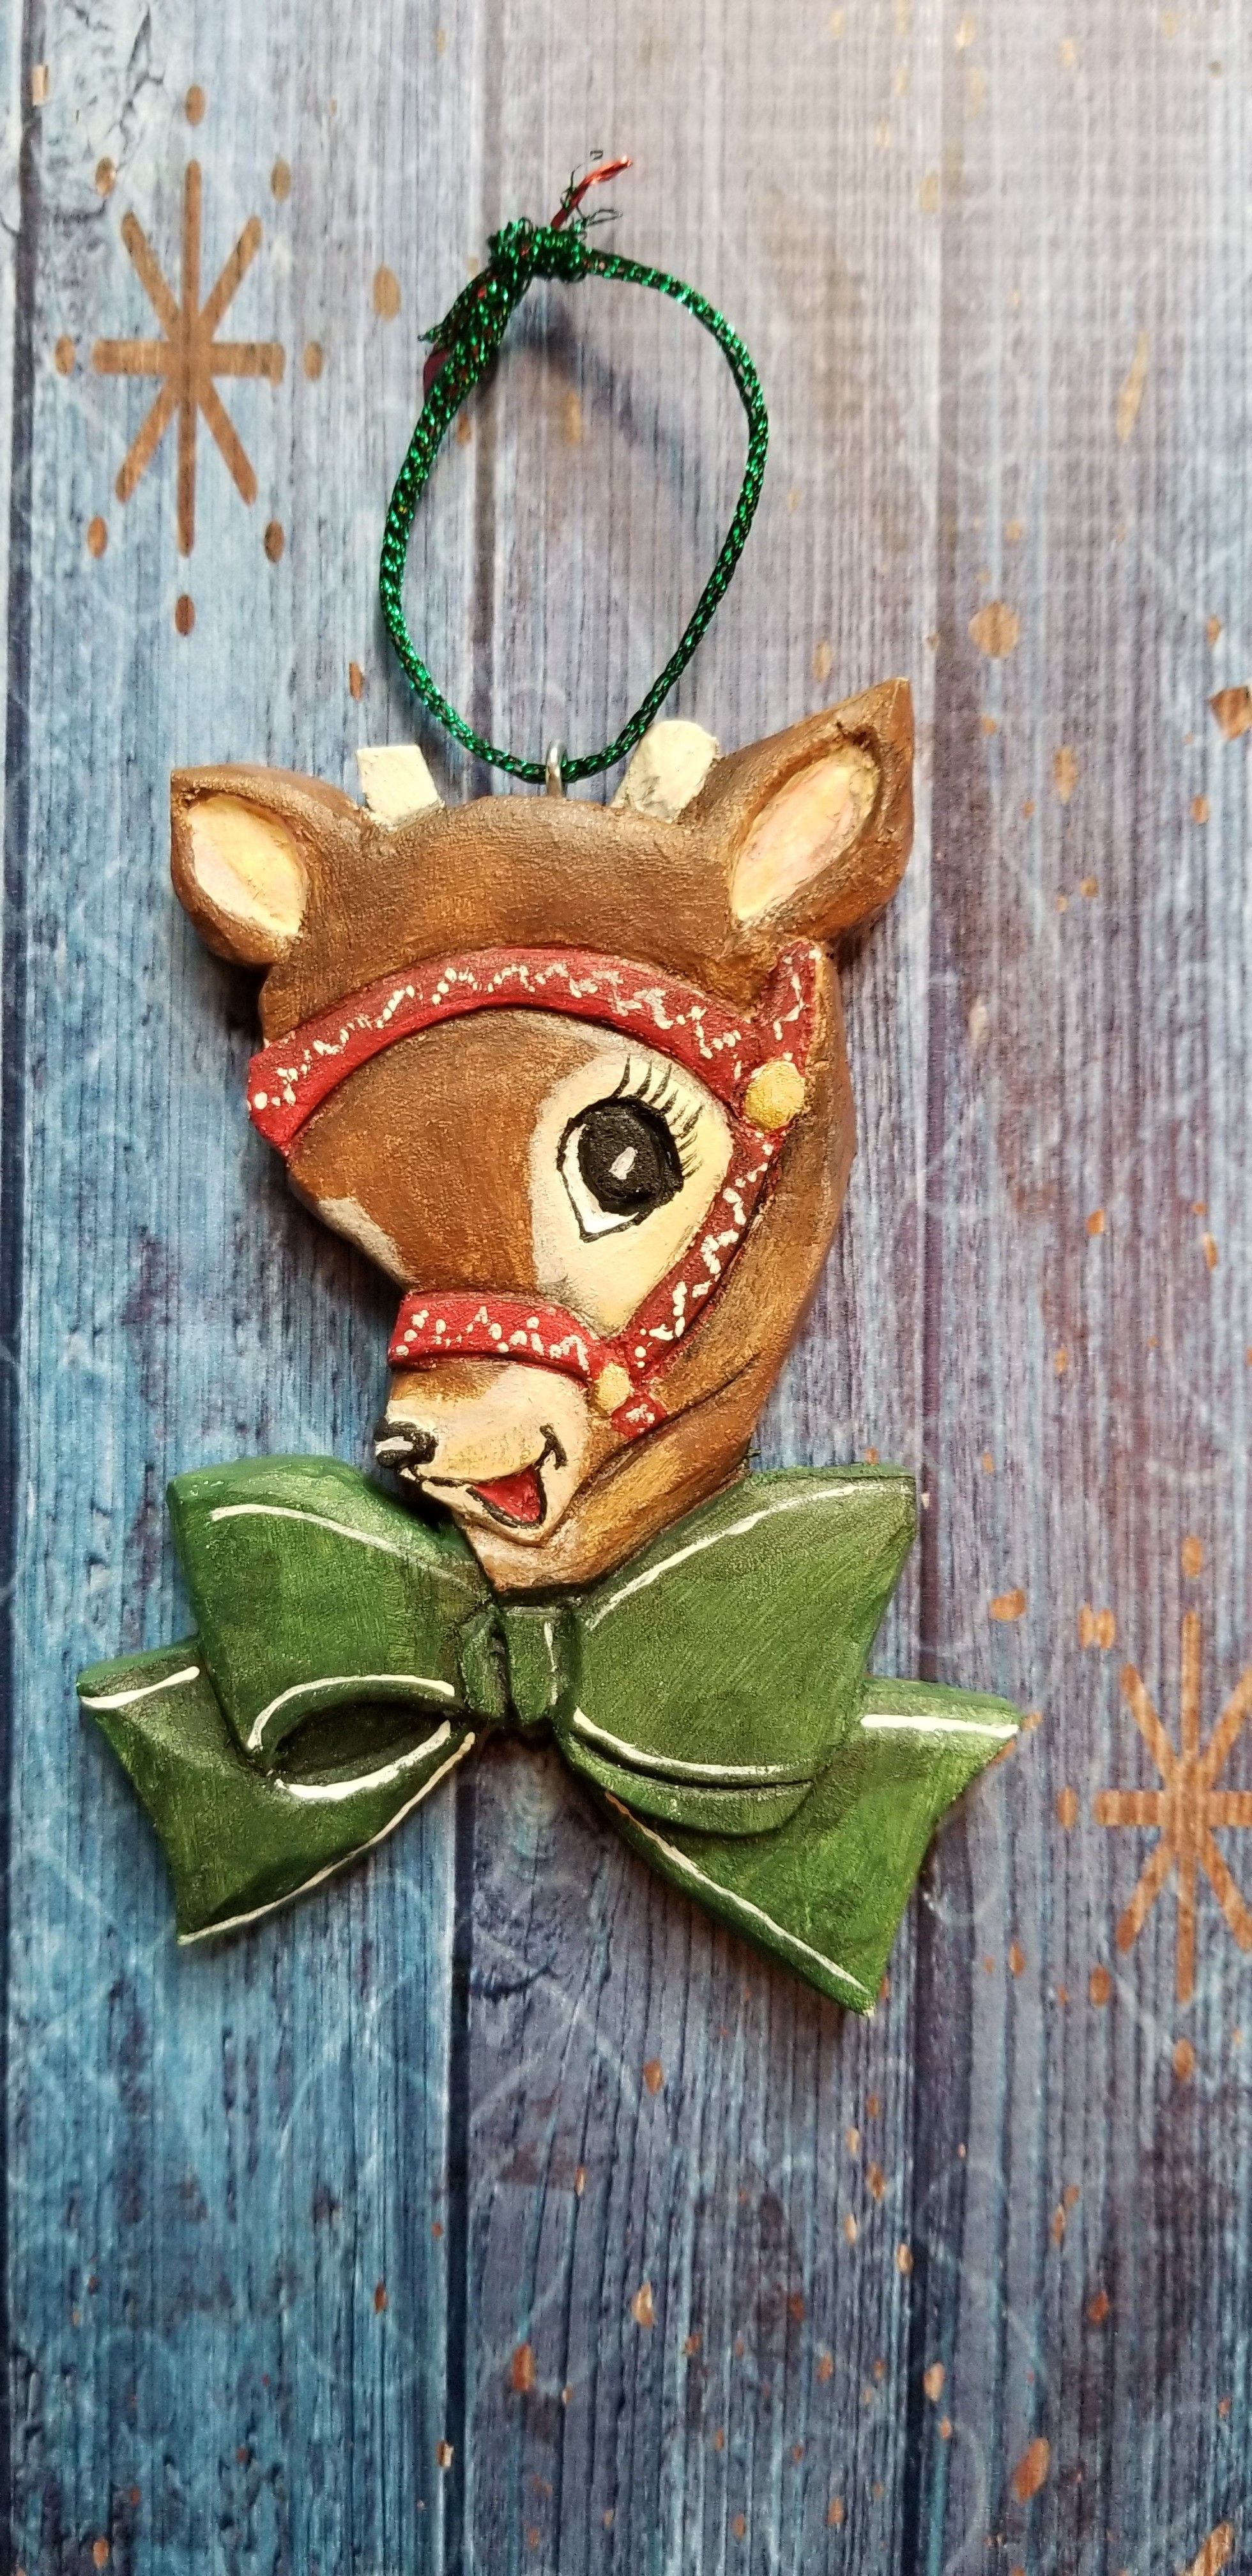 Sold Vintage Reindeer Ornament Hand Carved Wood Decoration Jill Motovidlak Vintage Christmas Ornaments Miniature Embroidery Folk Art Decor